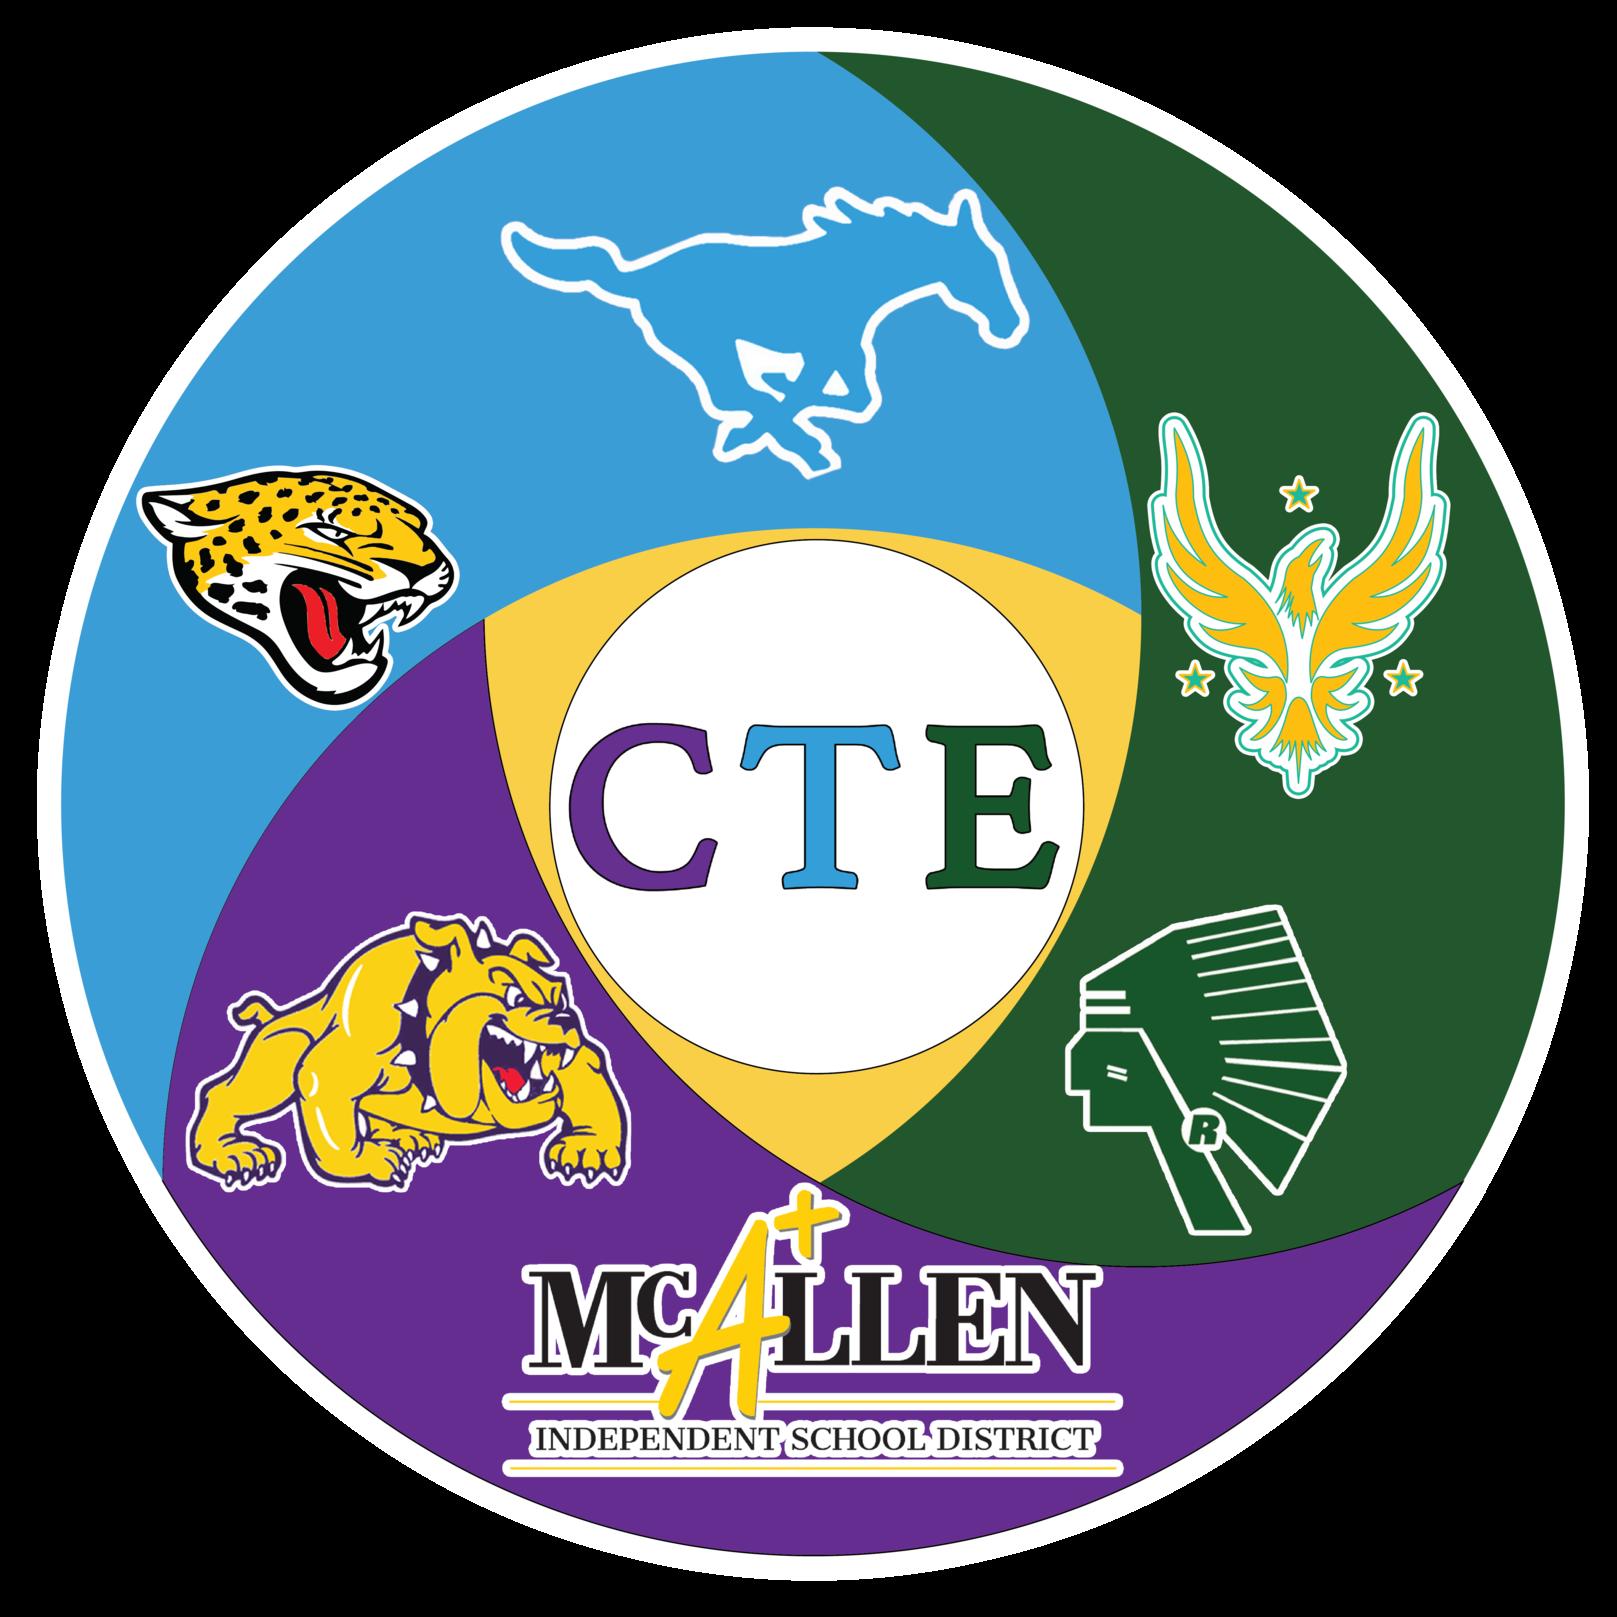 CTE logo with mascots